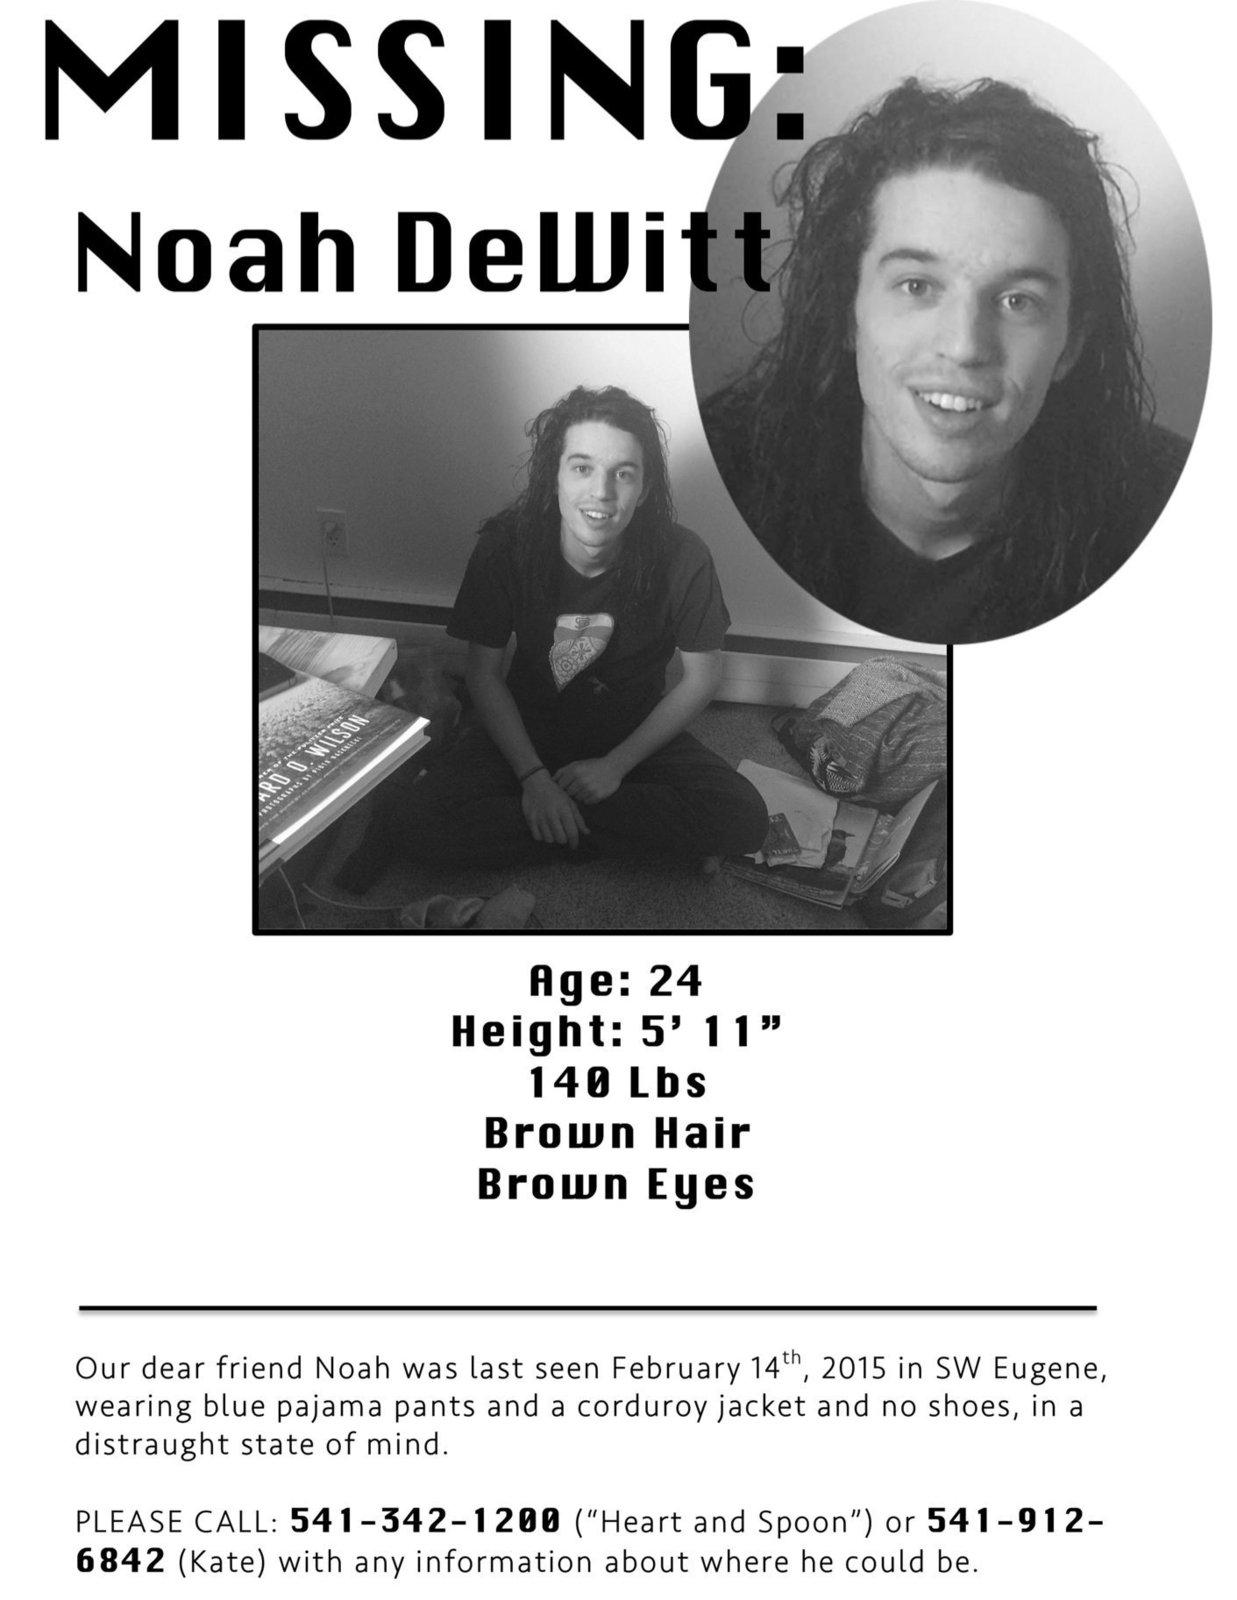 noah-dewitt-missing---flyer1jpg-88dfa828c6709a7f.jpg